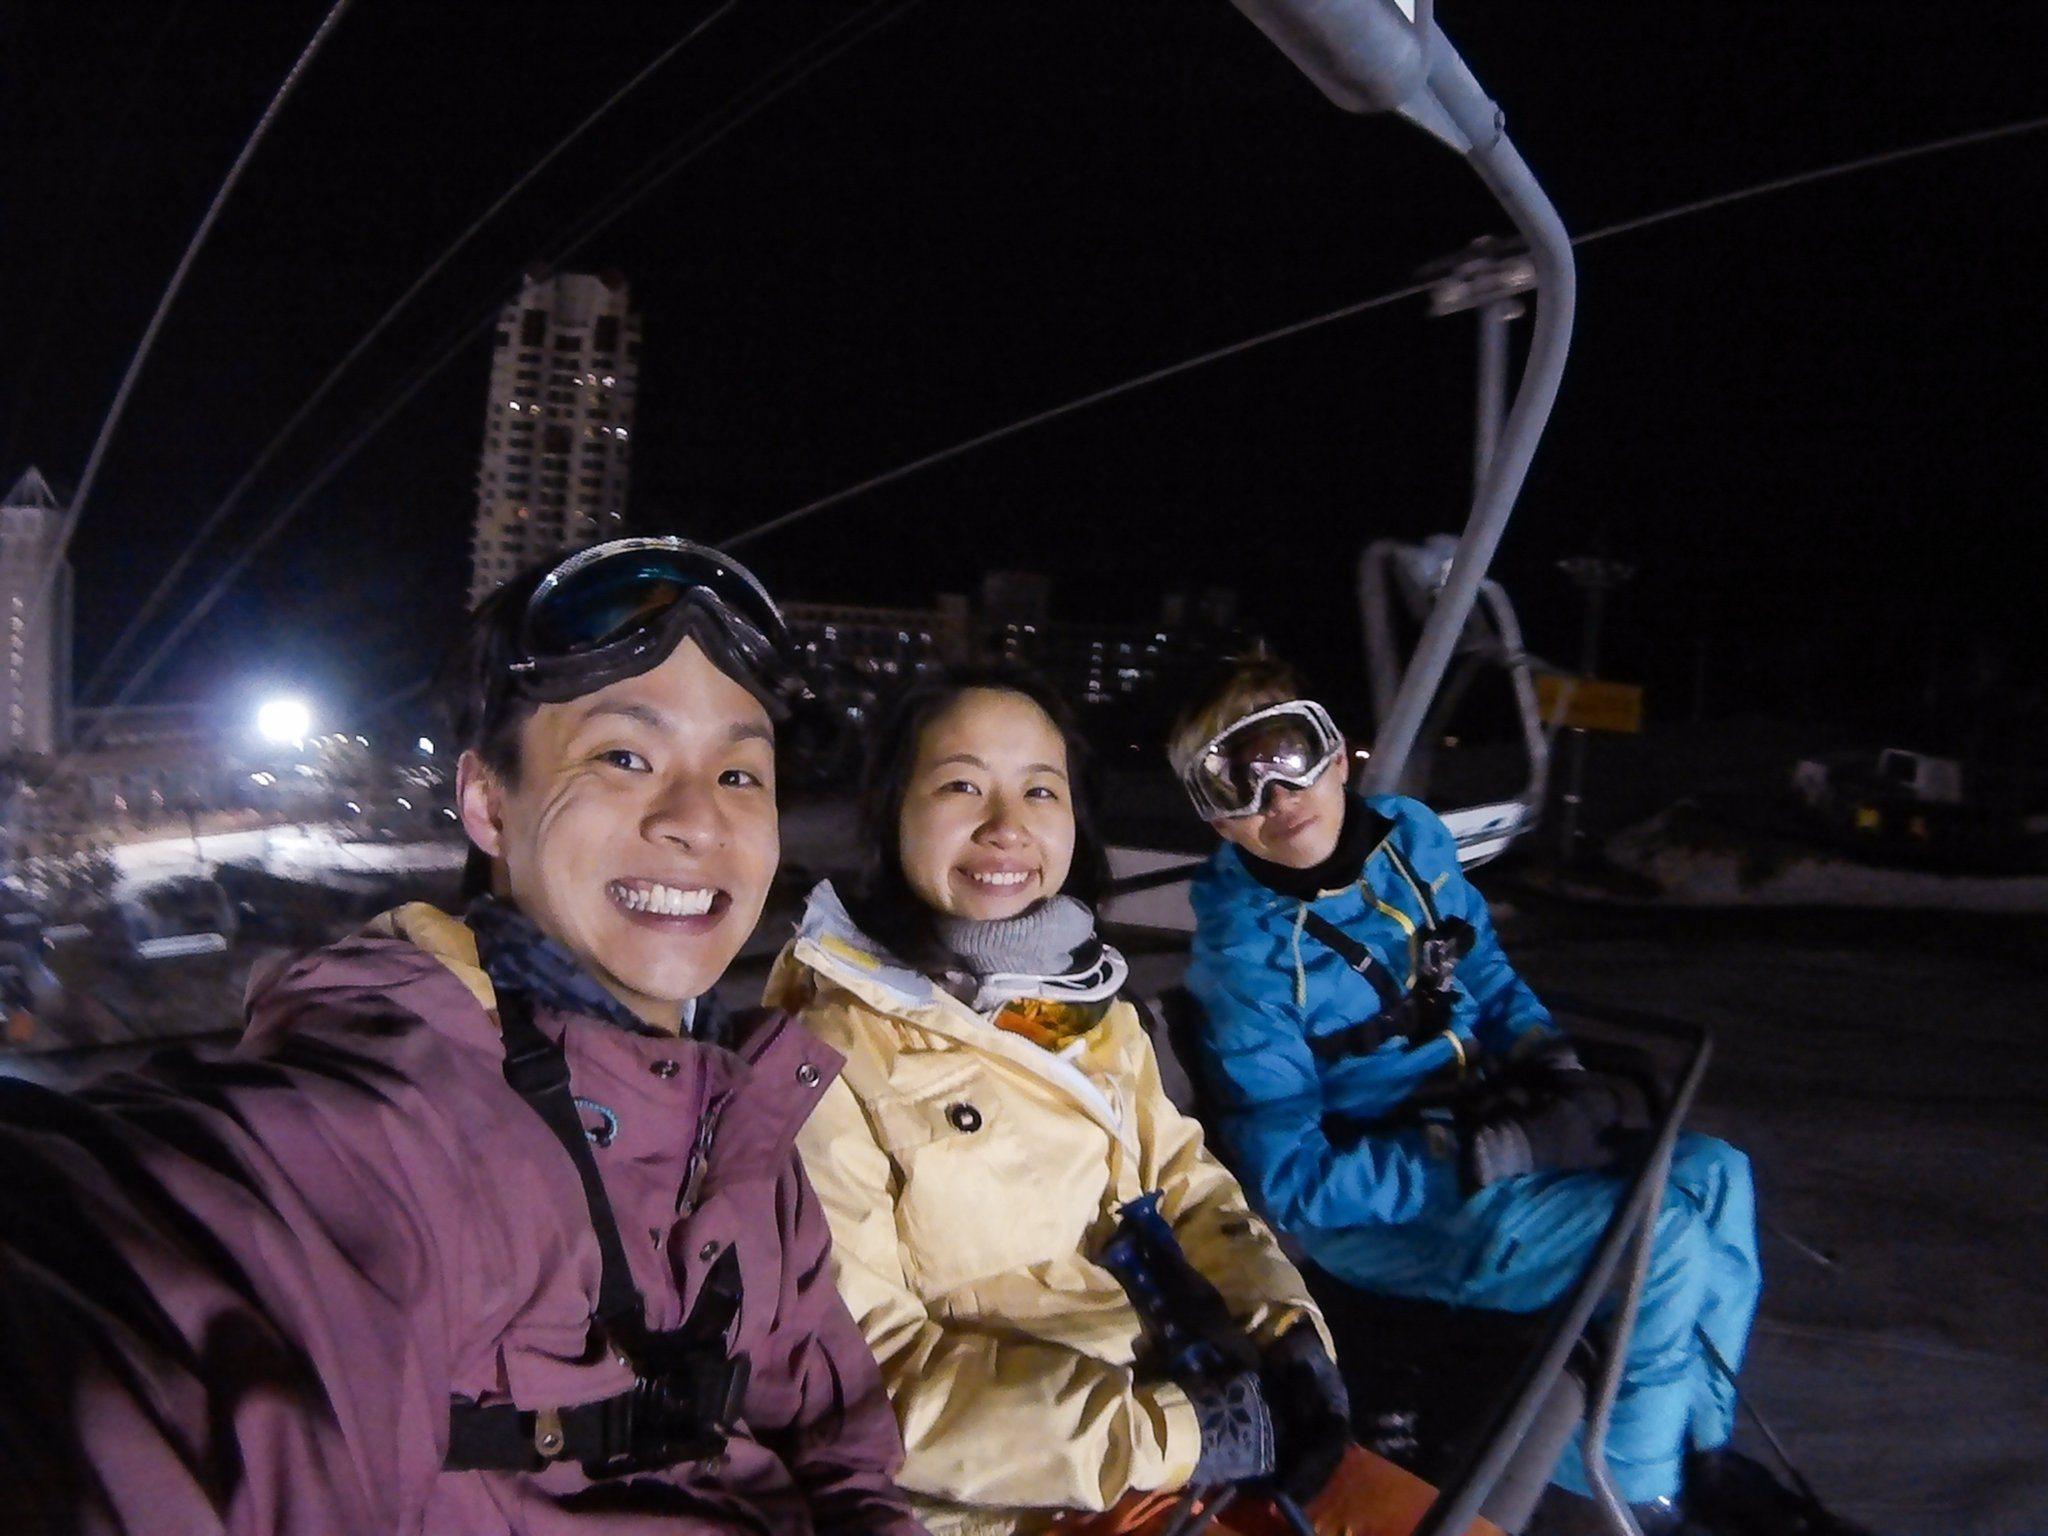 planning a ski trip night